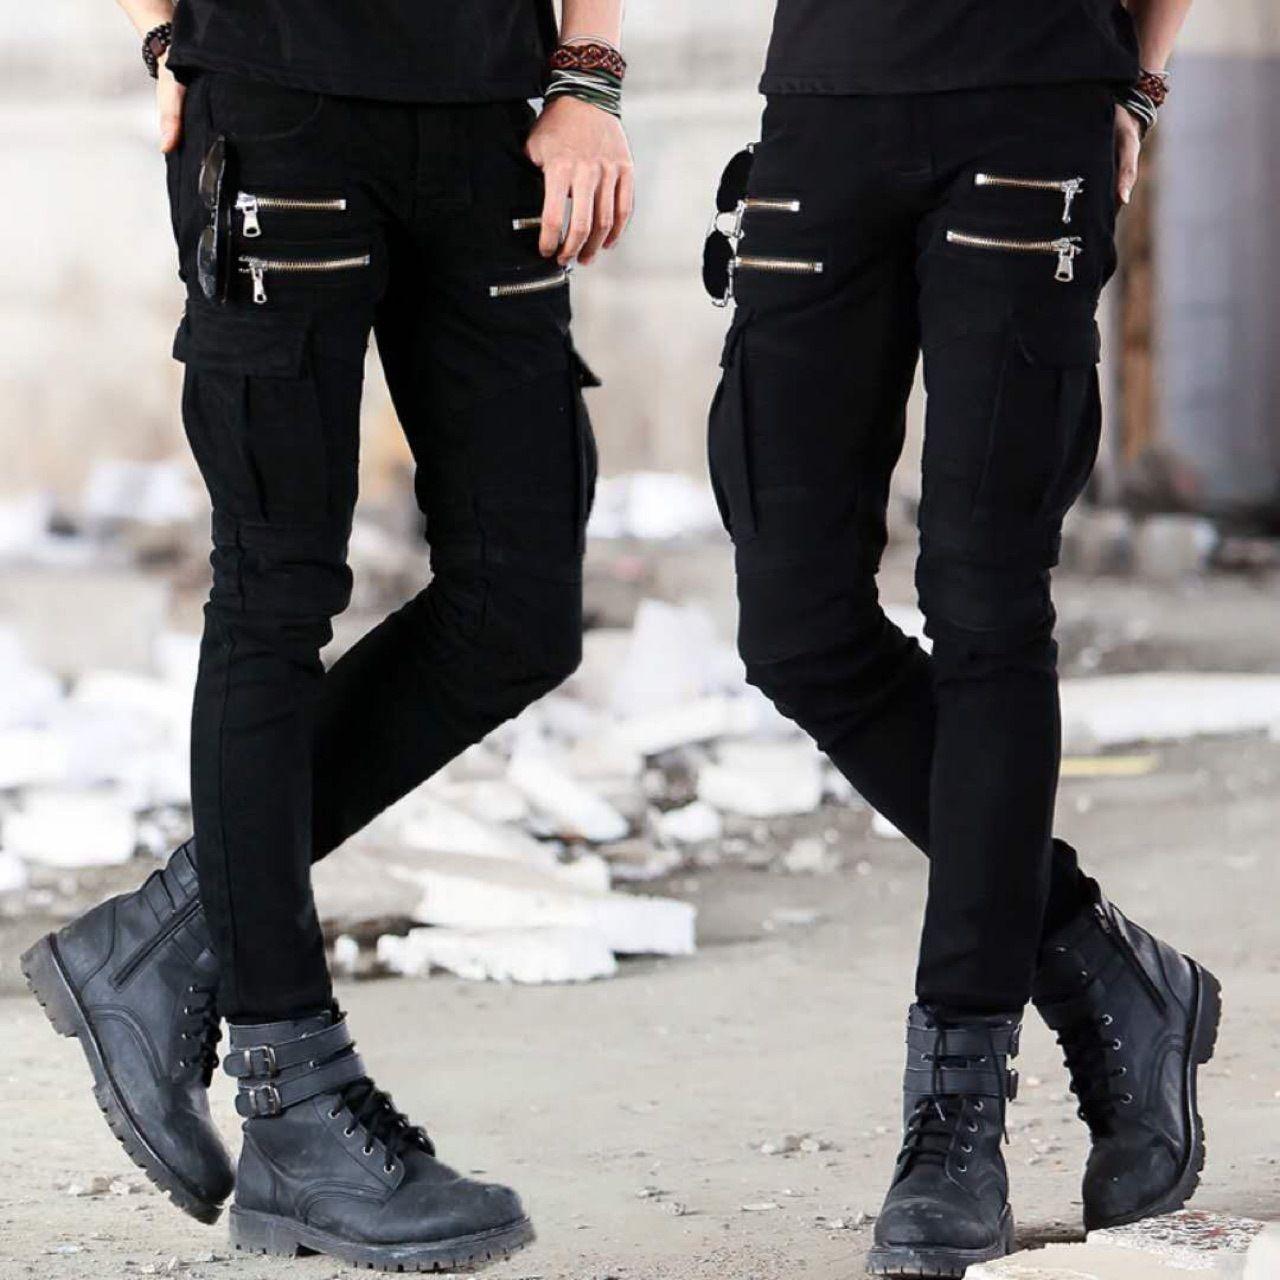 Motosiklet Denim Pantolon erkek Siyah Kot Moda Streç Fermuar Skinny Jeans Pileli Moto Biker Erkekler Ince Pantolon Sıcak Satış Q0105